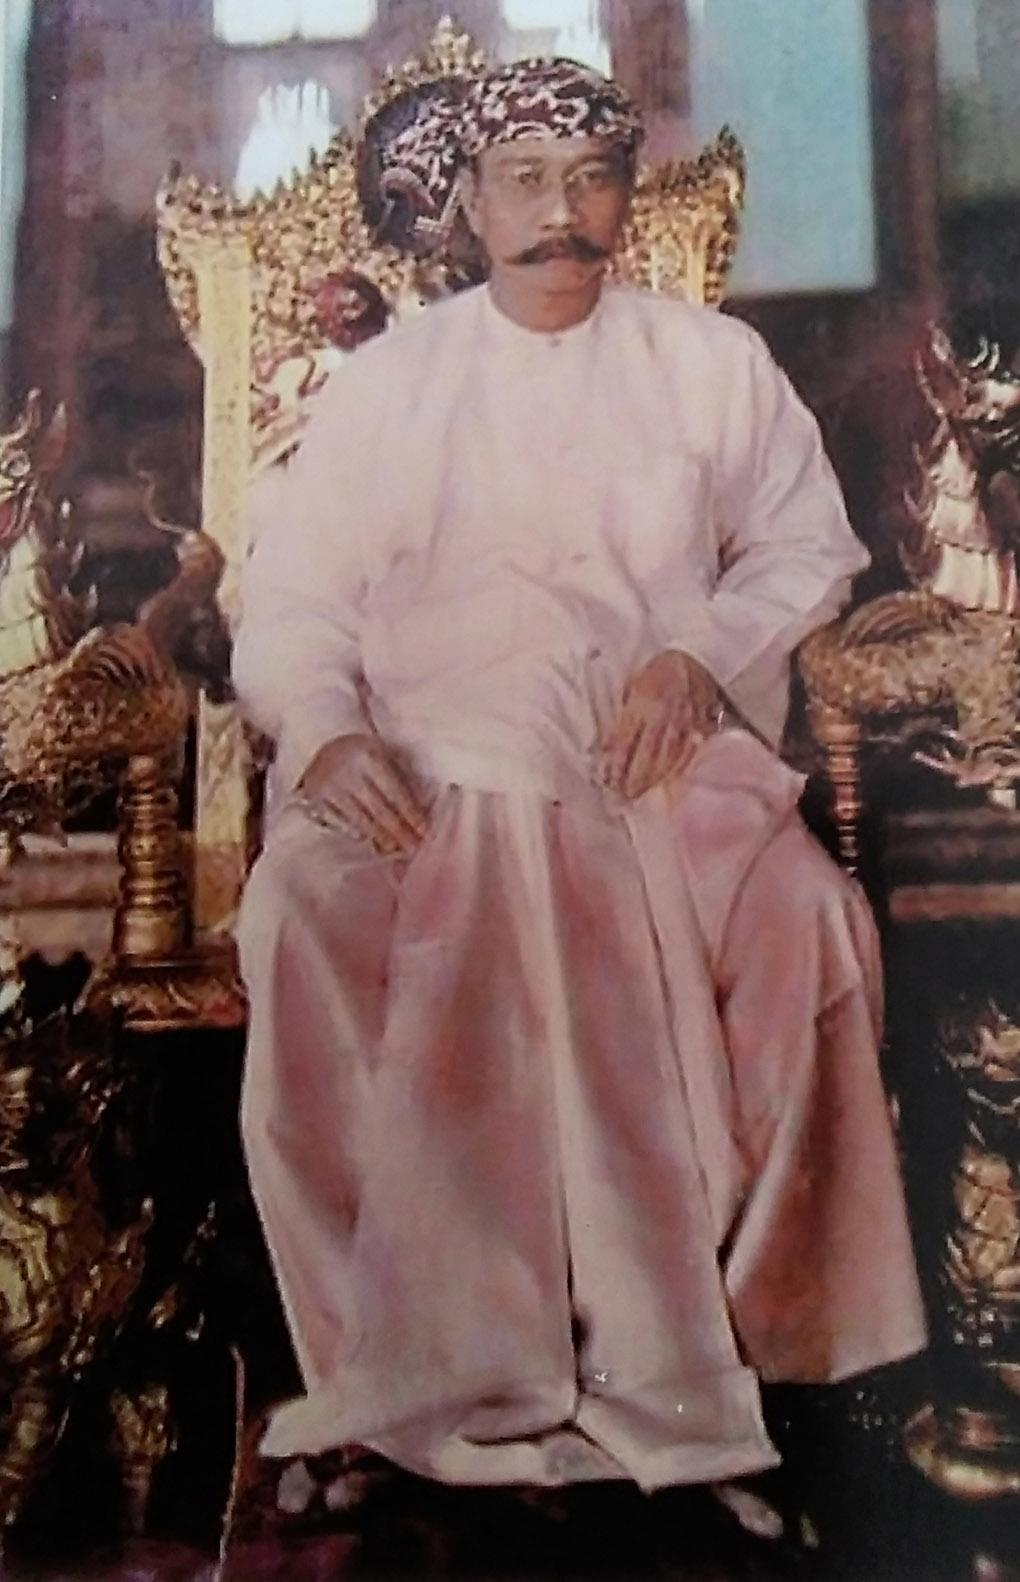 Sao Hkun Saing (aka) Sao Kya Khaing